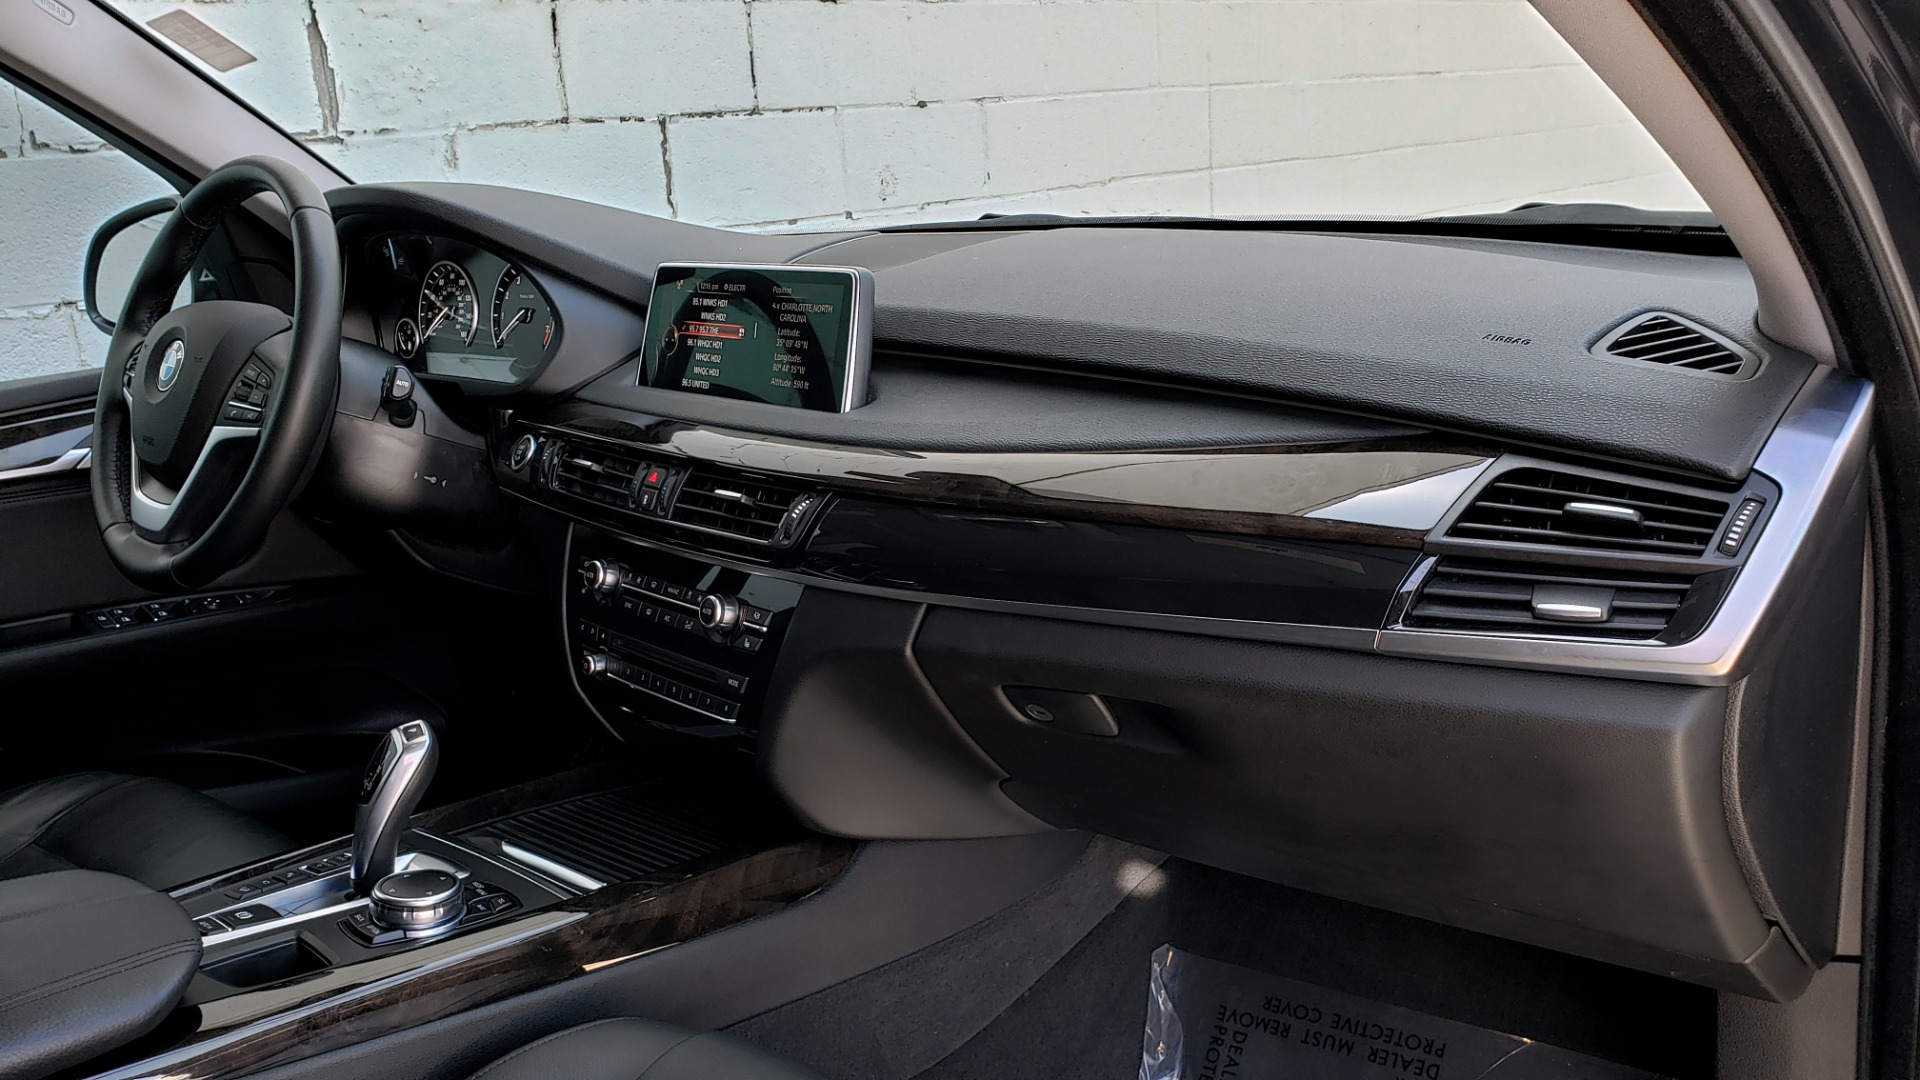 Used 2016 BMW X5 XDRIVE35I / PREM PKG / NAV / DRVR ASST PLUS / REARVIEW for sale $25,765 at Formula Imports in Charlotte NC 28227 48